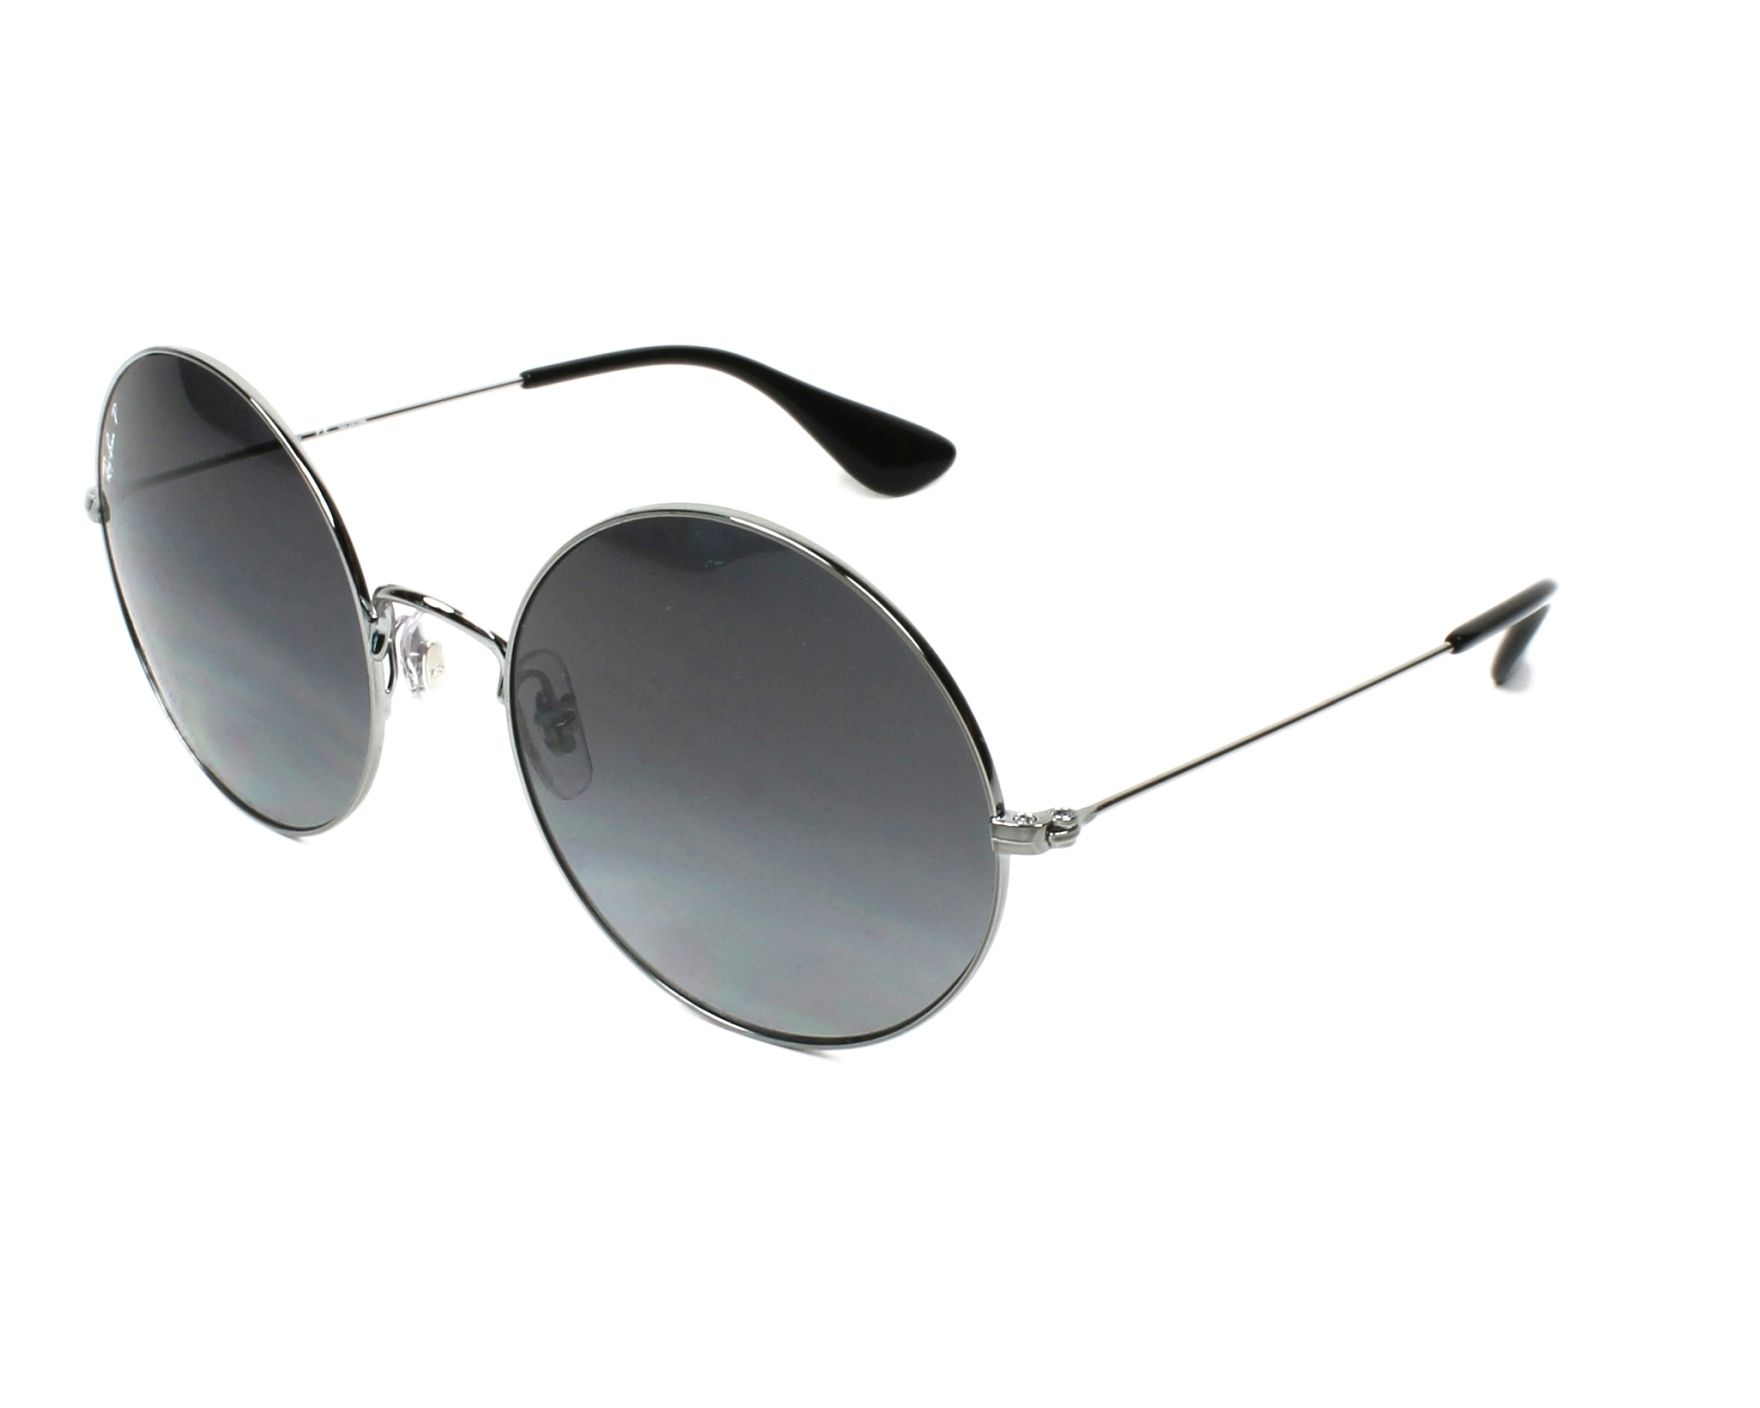 8807021d82 Sunglasses Ray-Ban RB-3592 004 T3 50-20 Gun profile view